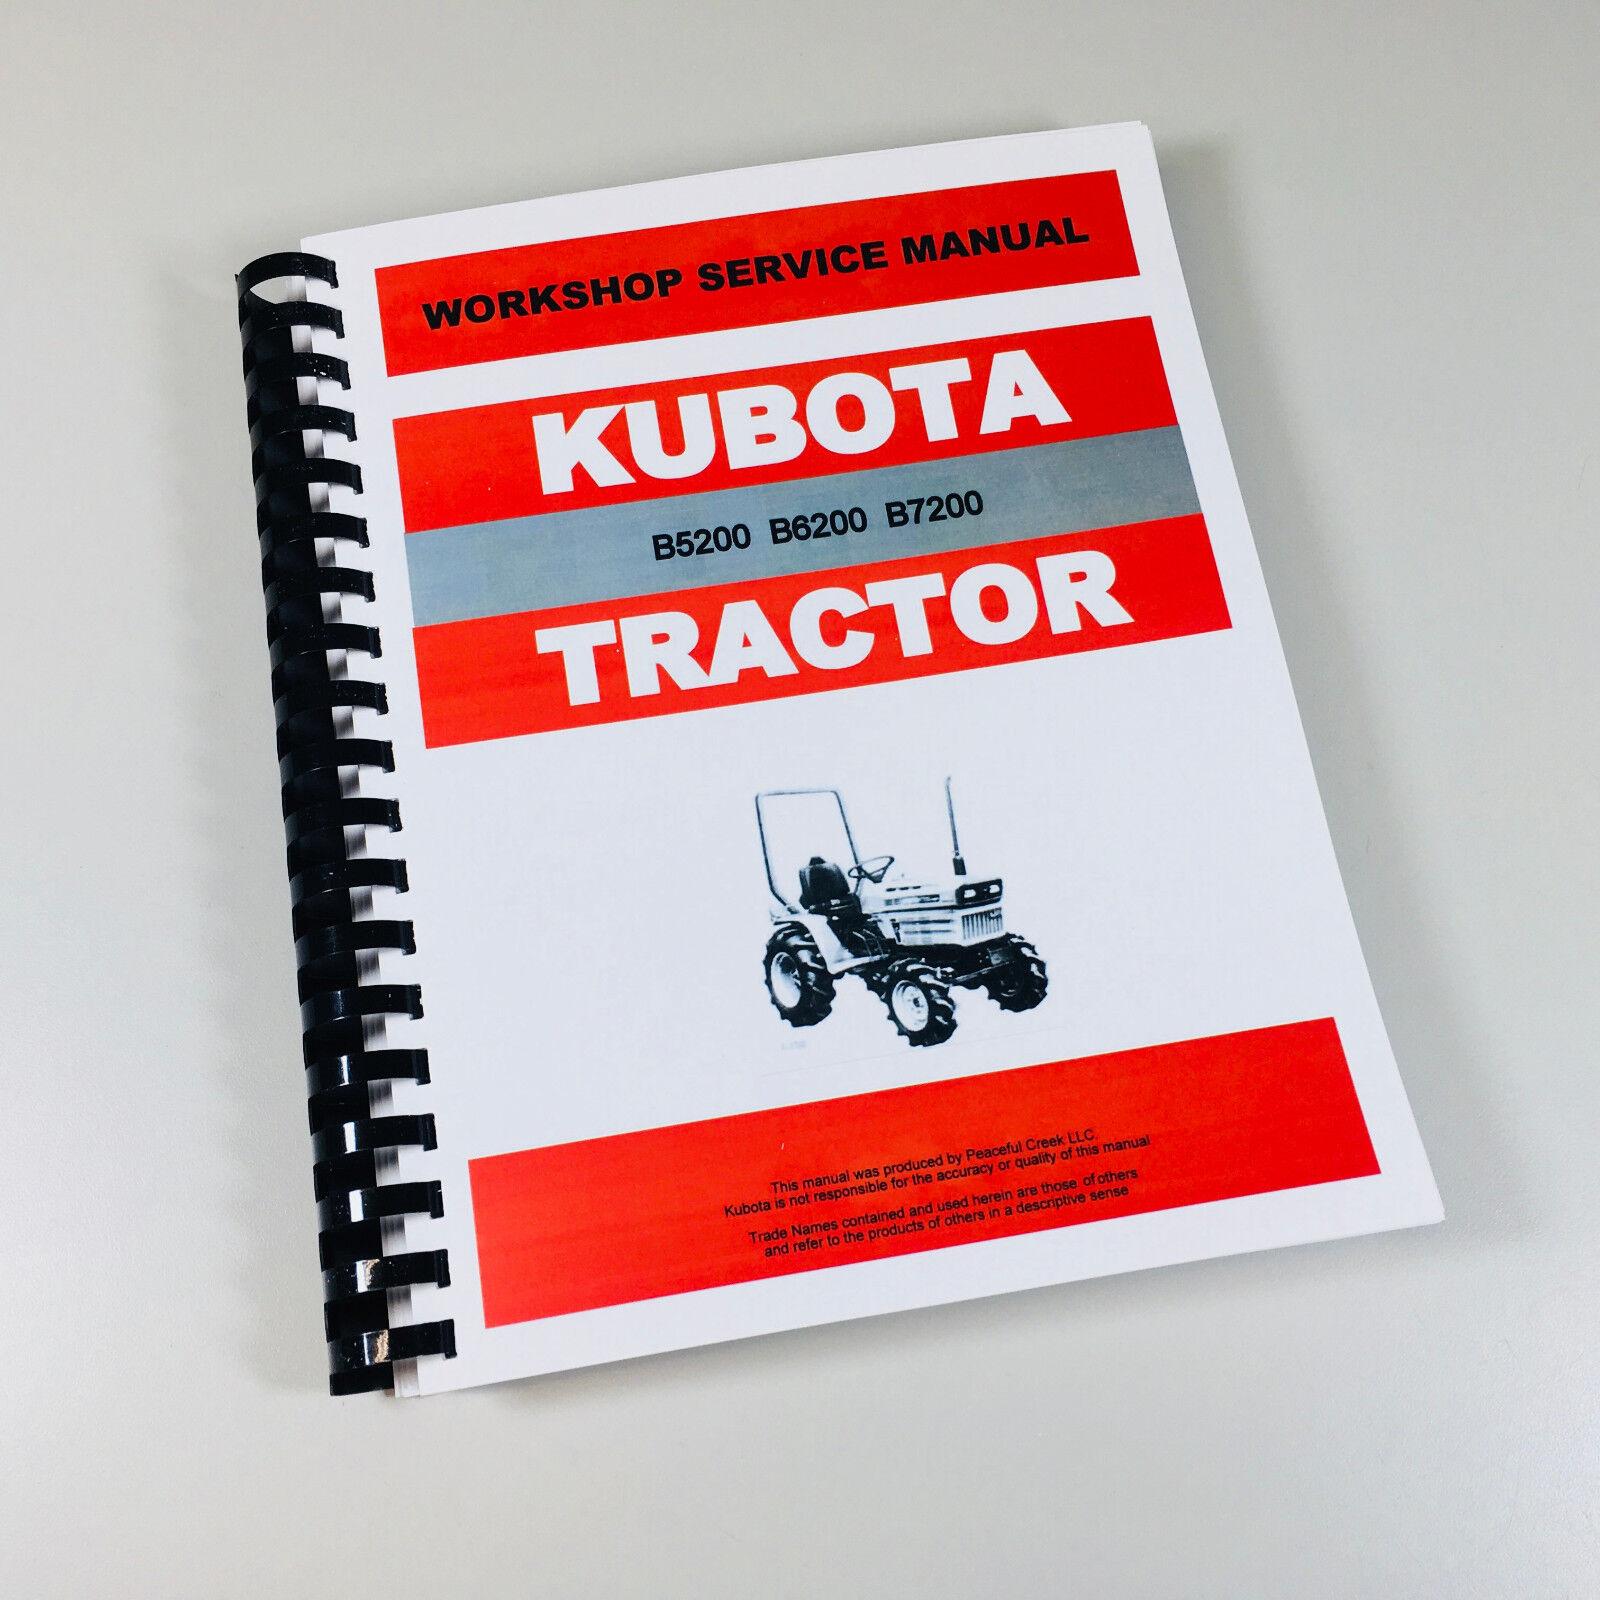 B6200 Kubota Wiring Diagram Enthusiast Diagrams B8200 Parts Electrical Rh Cytrus Co Manual